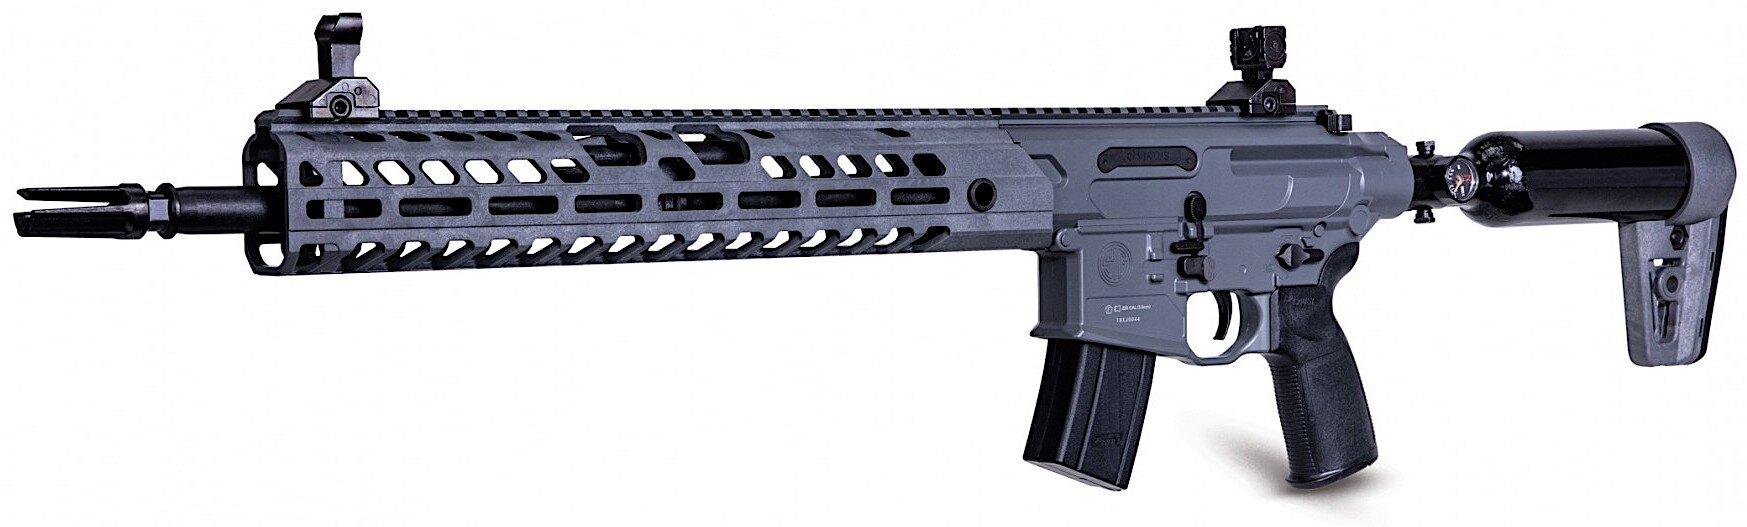 Sig Sauer Mcx Virtus Pcp 22 Caliber Pellet Rifle Field Test Review Replica Airguns Blog Airsoft Pellet Bb Gun Reviews